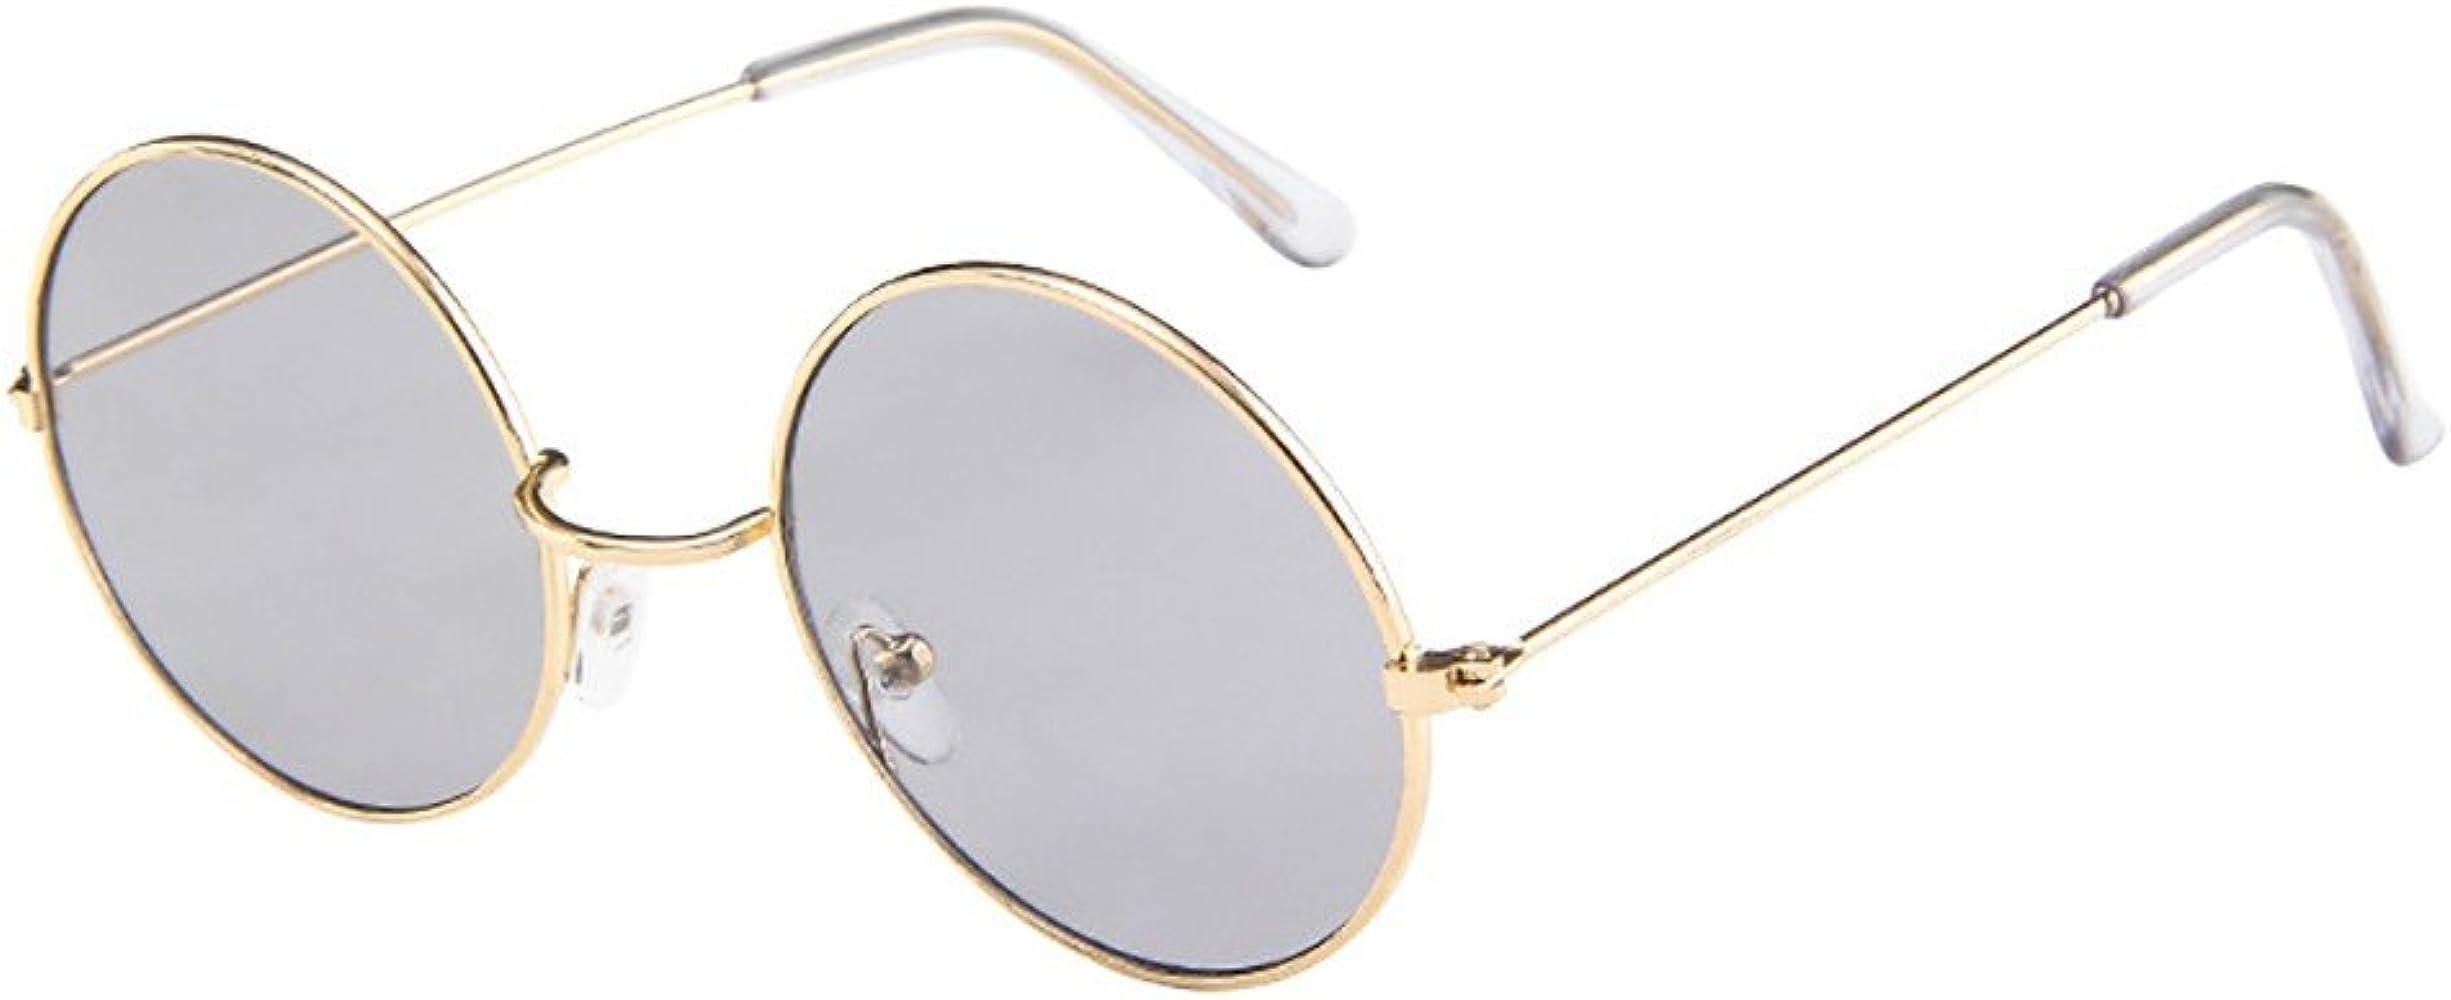 FORUU Glasses Men Women Square Vintage Mirrored Sunglasses Eyewear Outdoor Sports